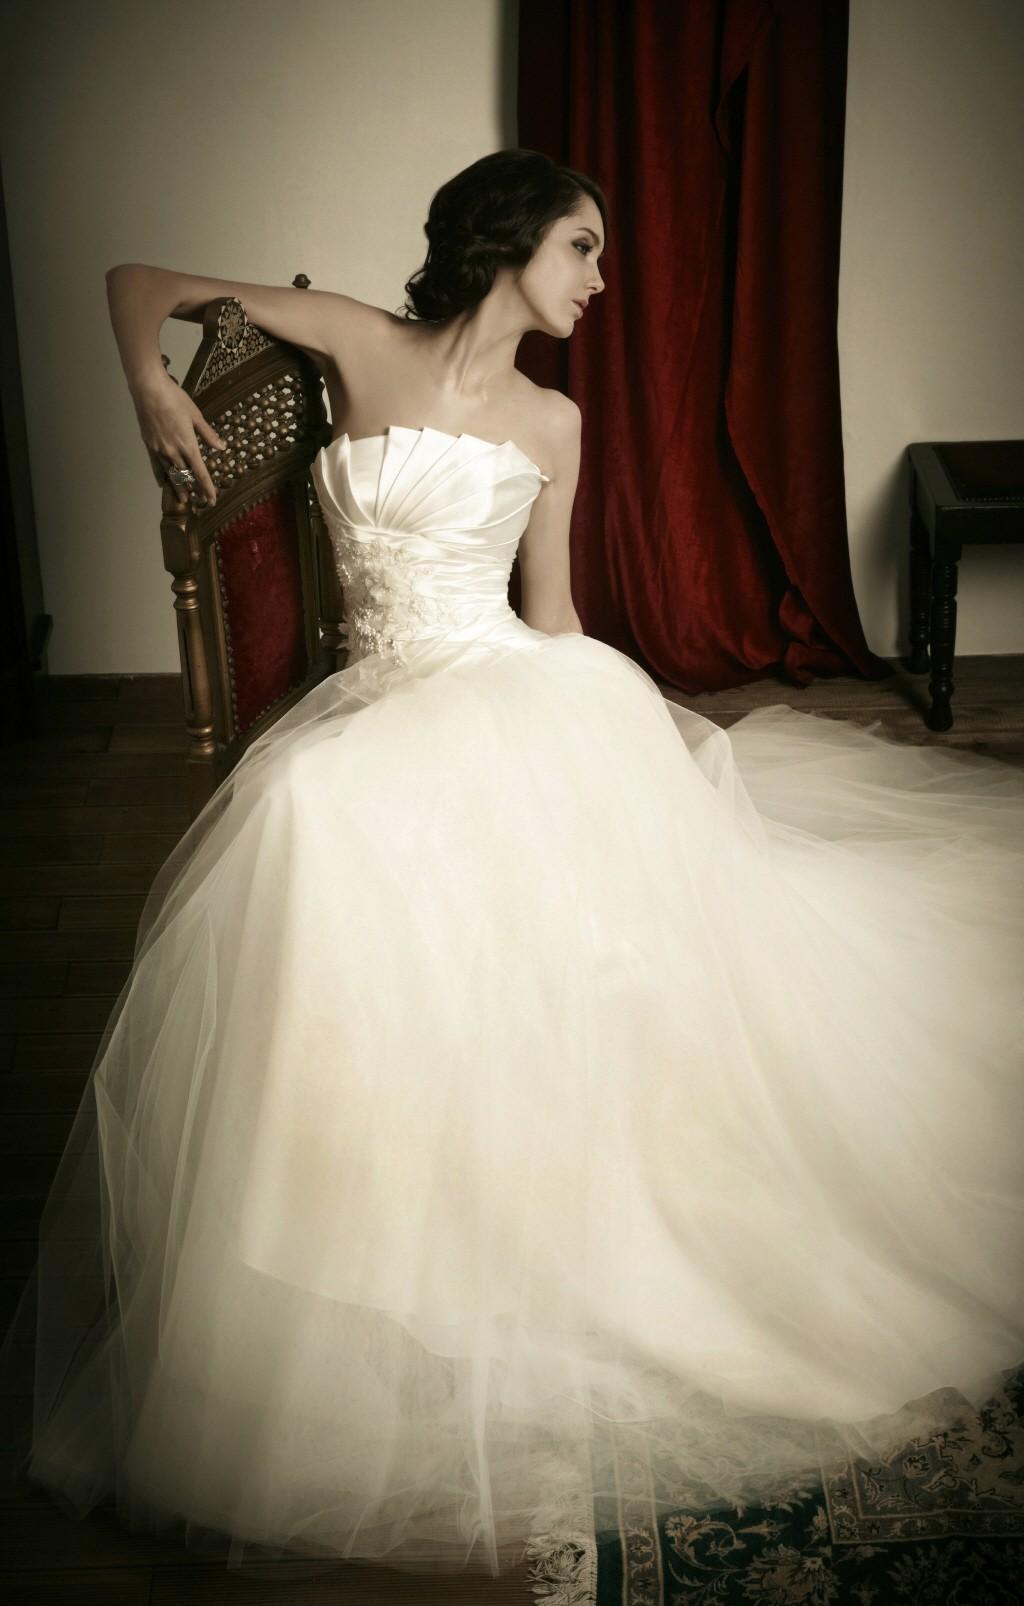 Wedding Dress KW-02 - Bora Online Store Brisbane | Bora Fashion ...